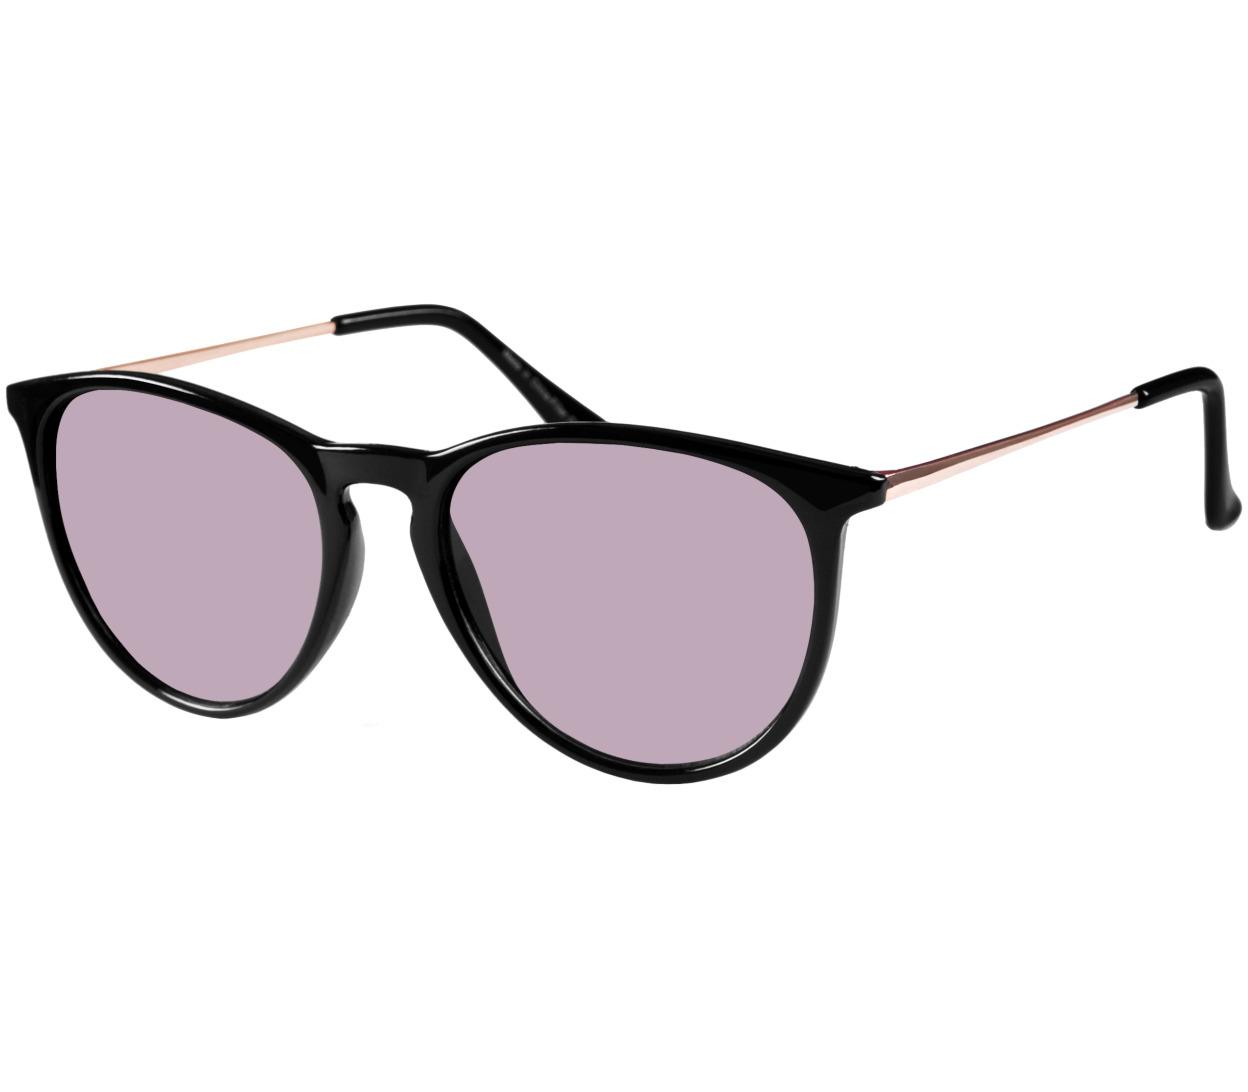 Main Image (Angle) - Paradise (Black) Retro Sunglasses